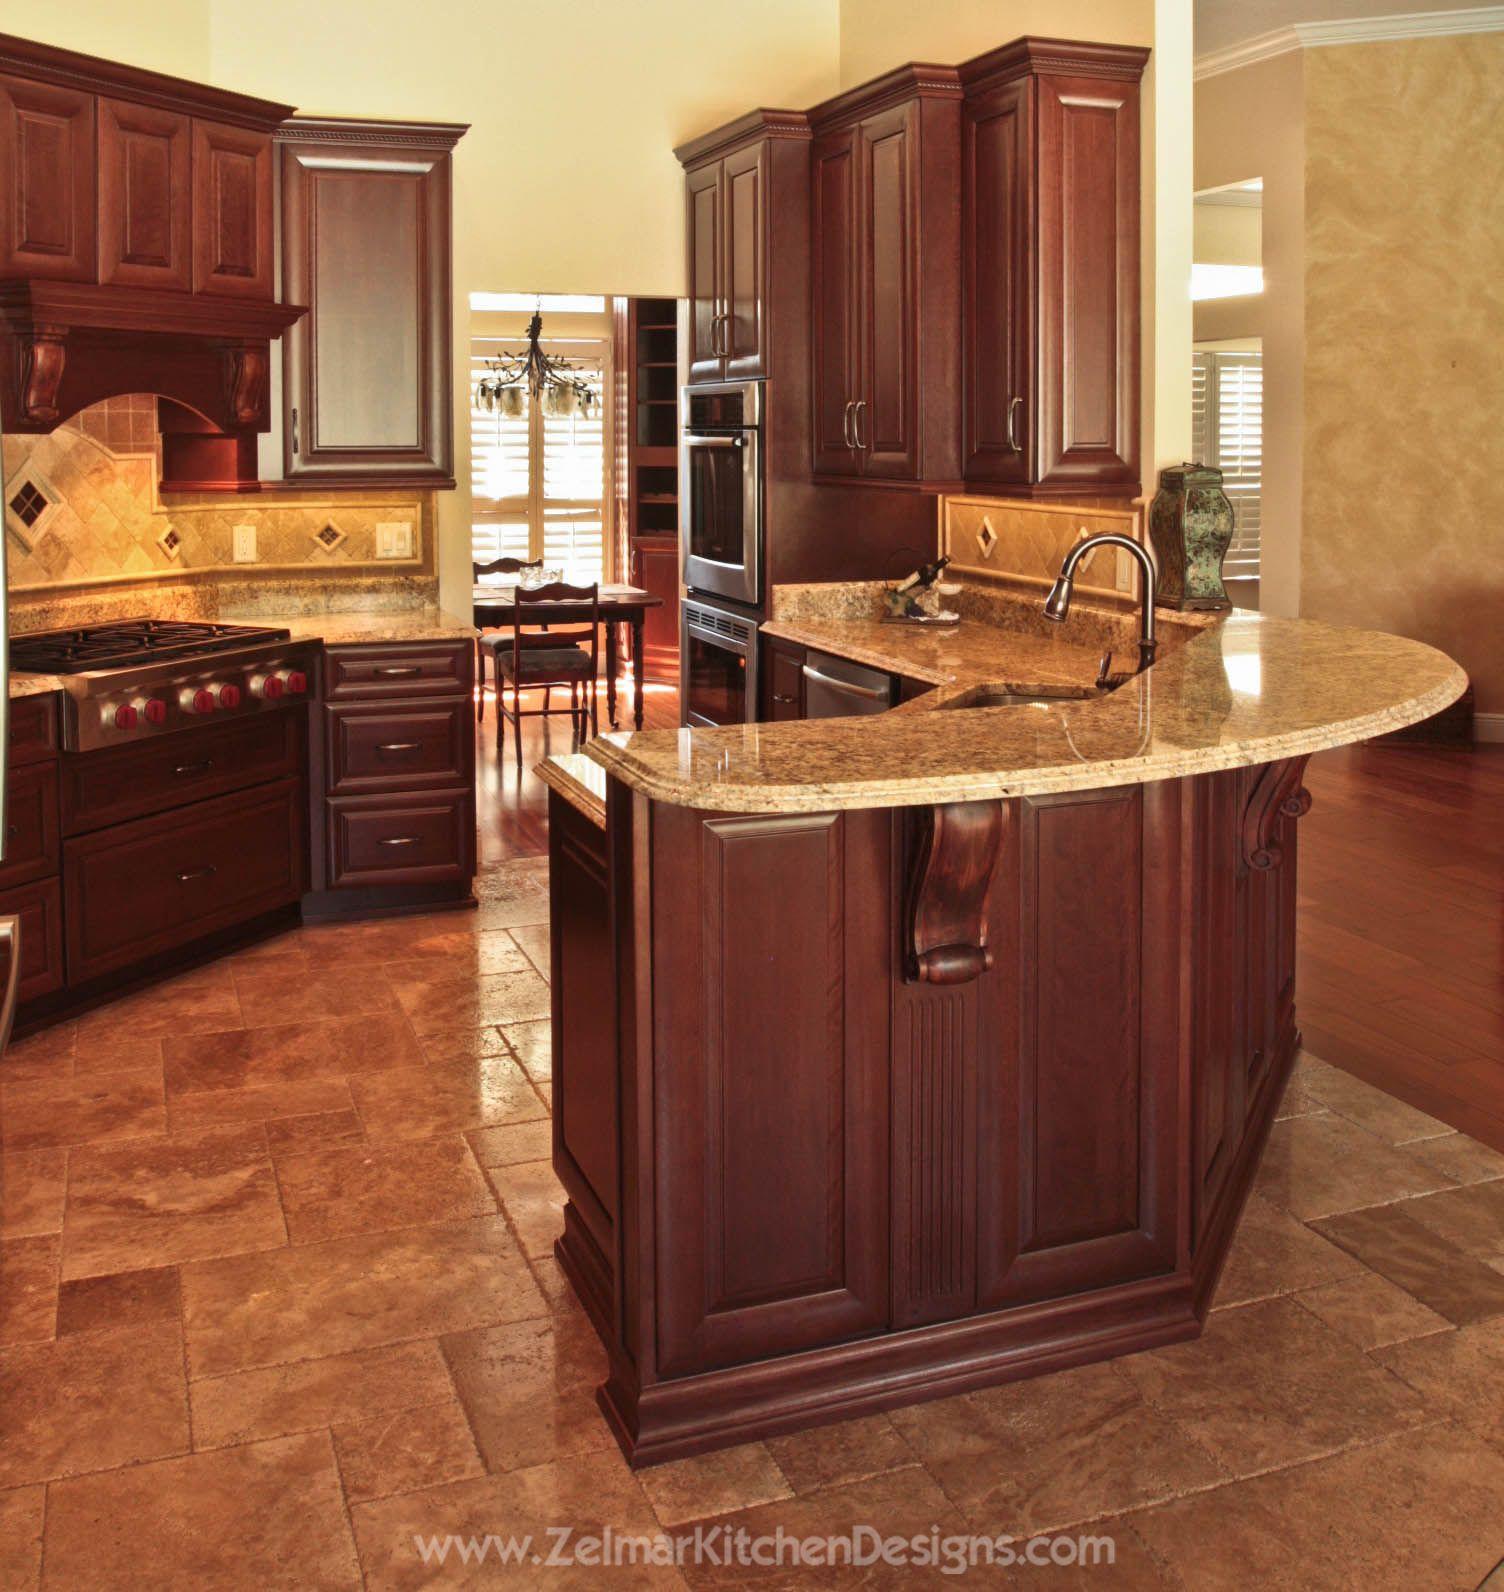 DREAM KITCHEN W/ Granite Countertops And Custom Cabinets. Visit Https://www.zelmarkitchendesigns